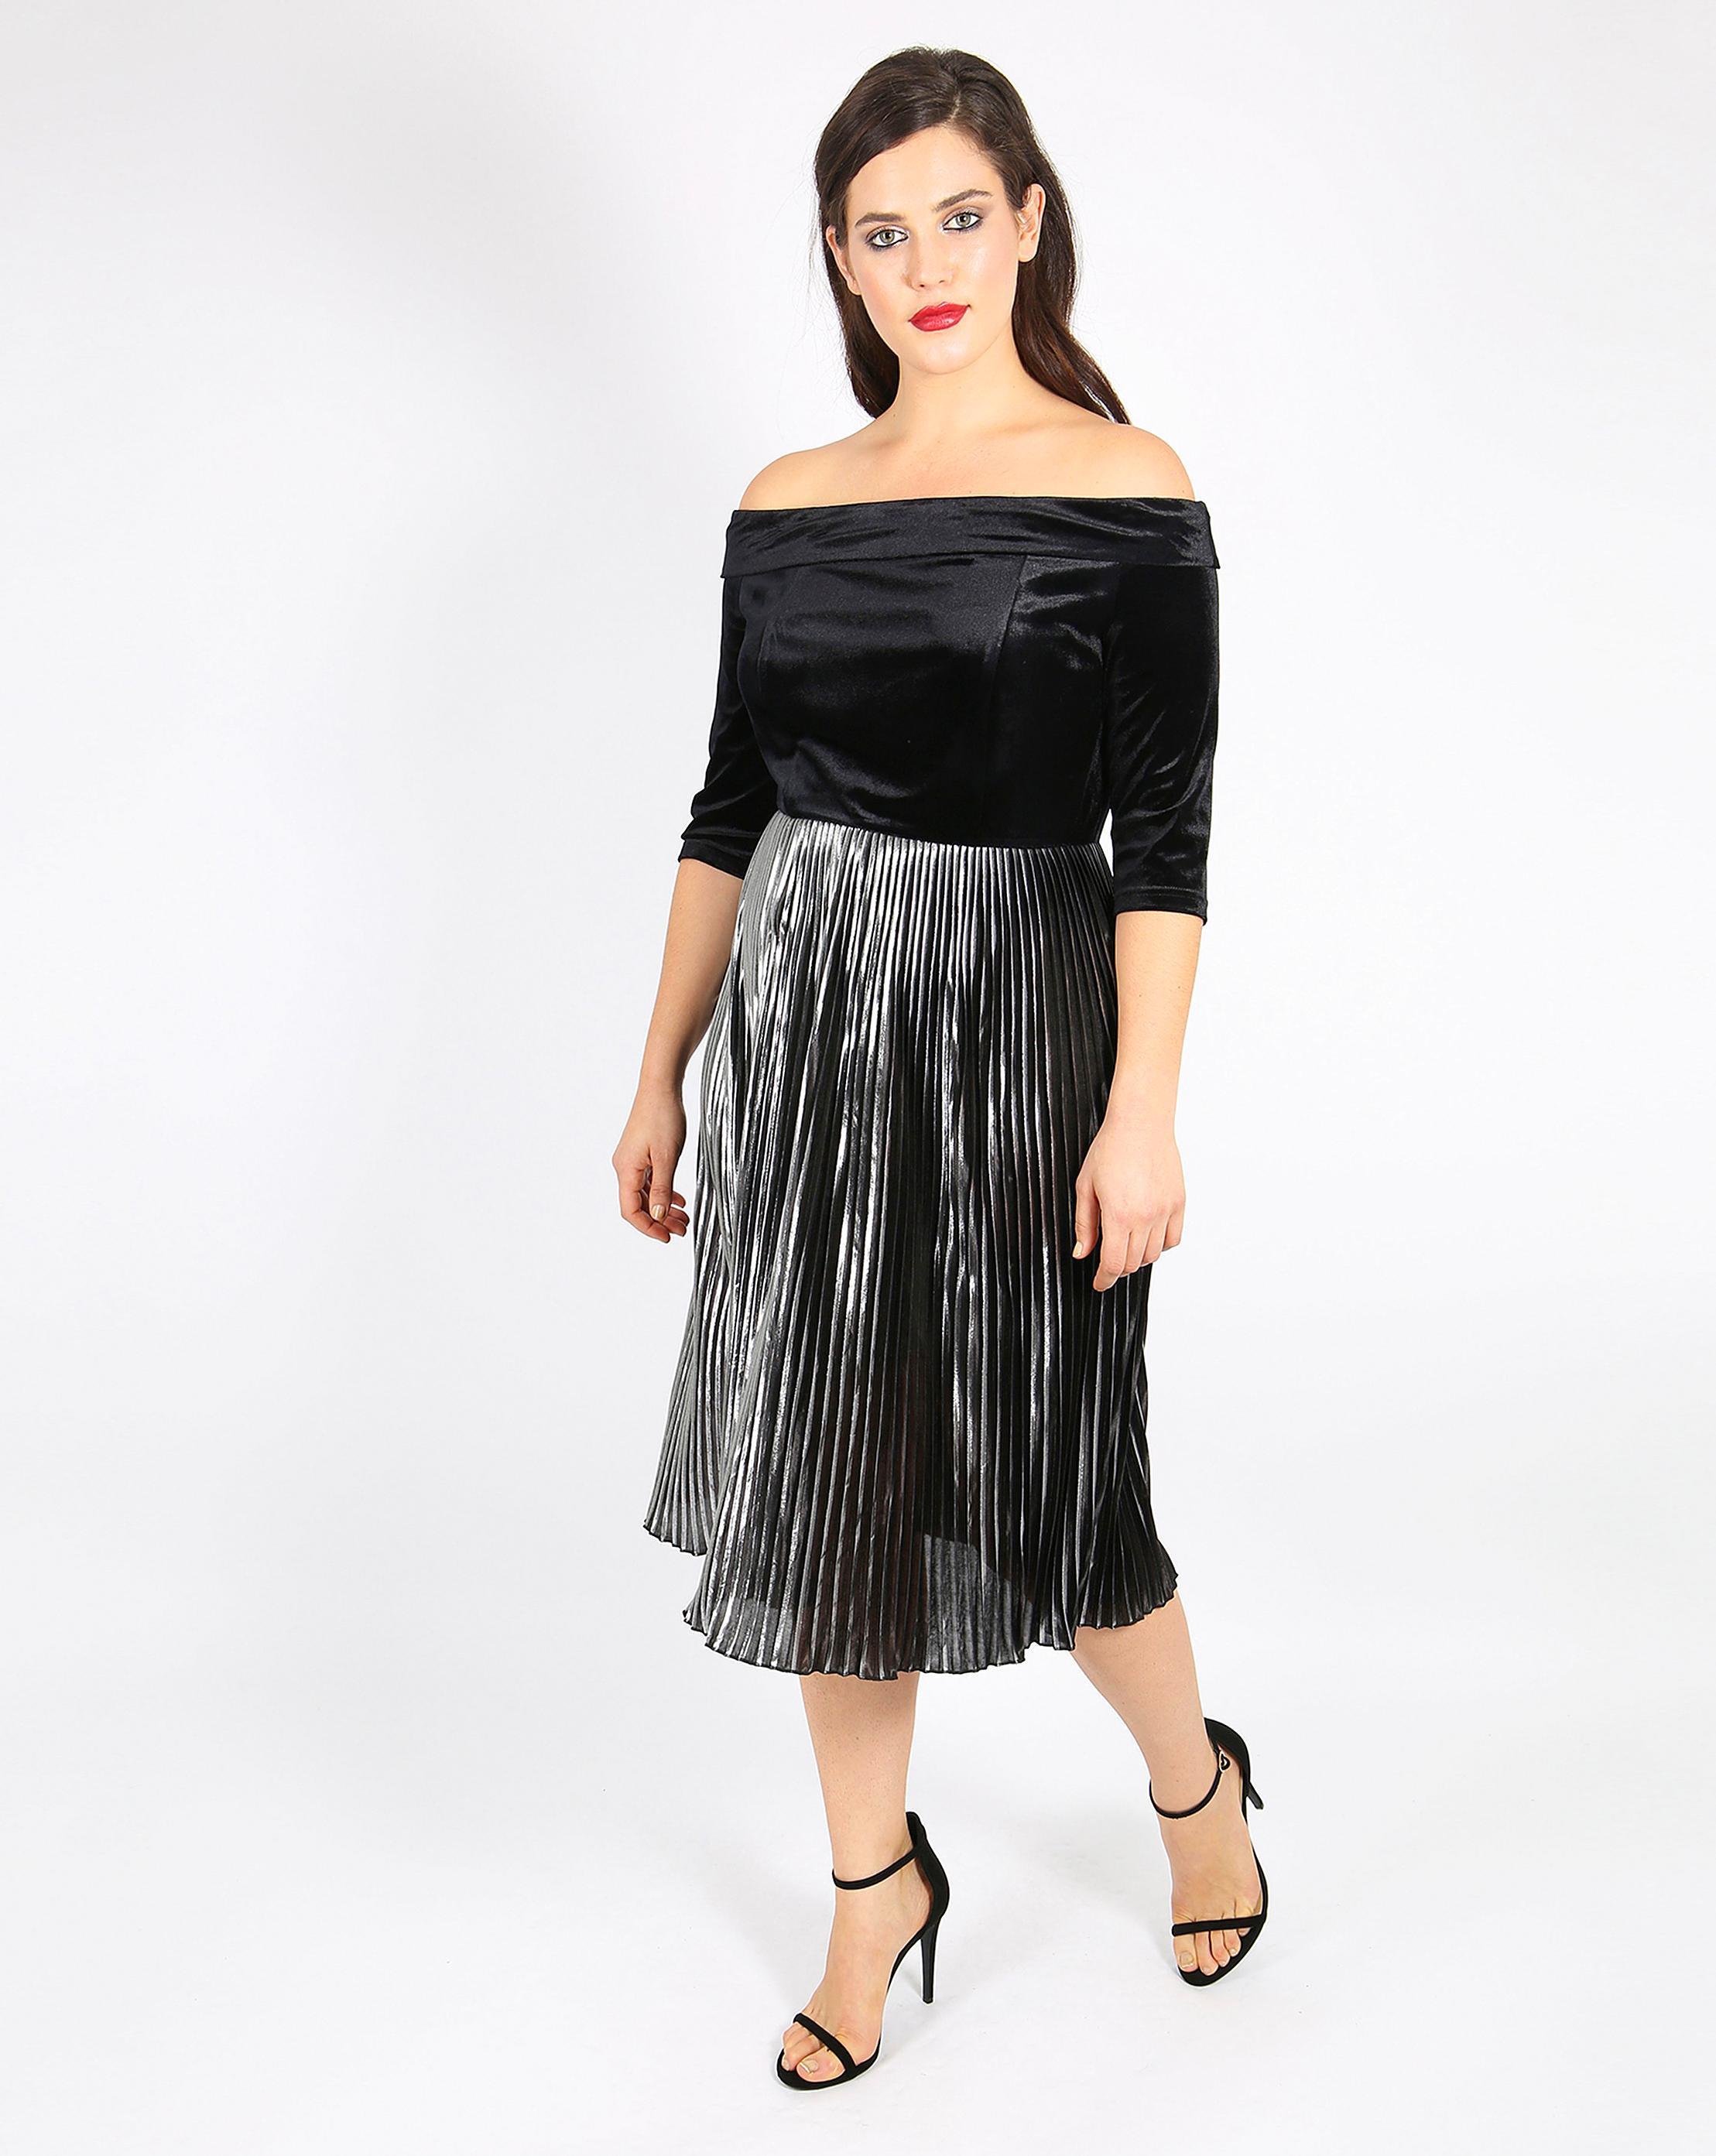 7f9e836a736 Off The Shoulder Dress Pleated Skirt | Huston Fislar Photography